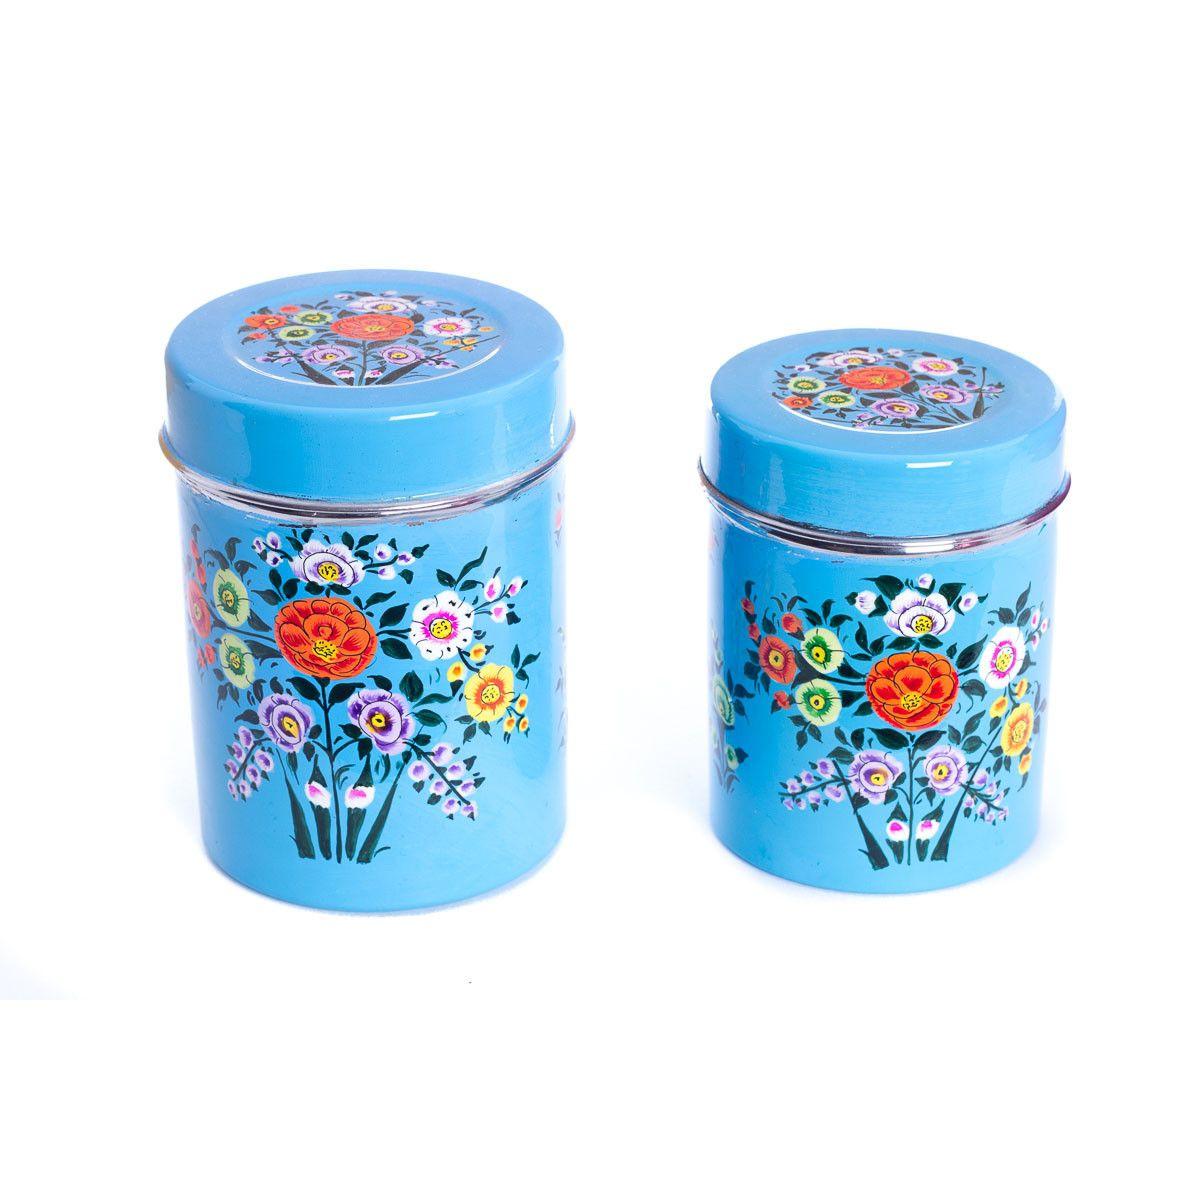 Boites-inox-peinte-a-la-main-Akola